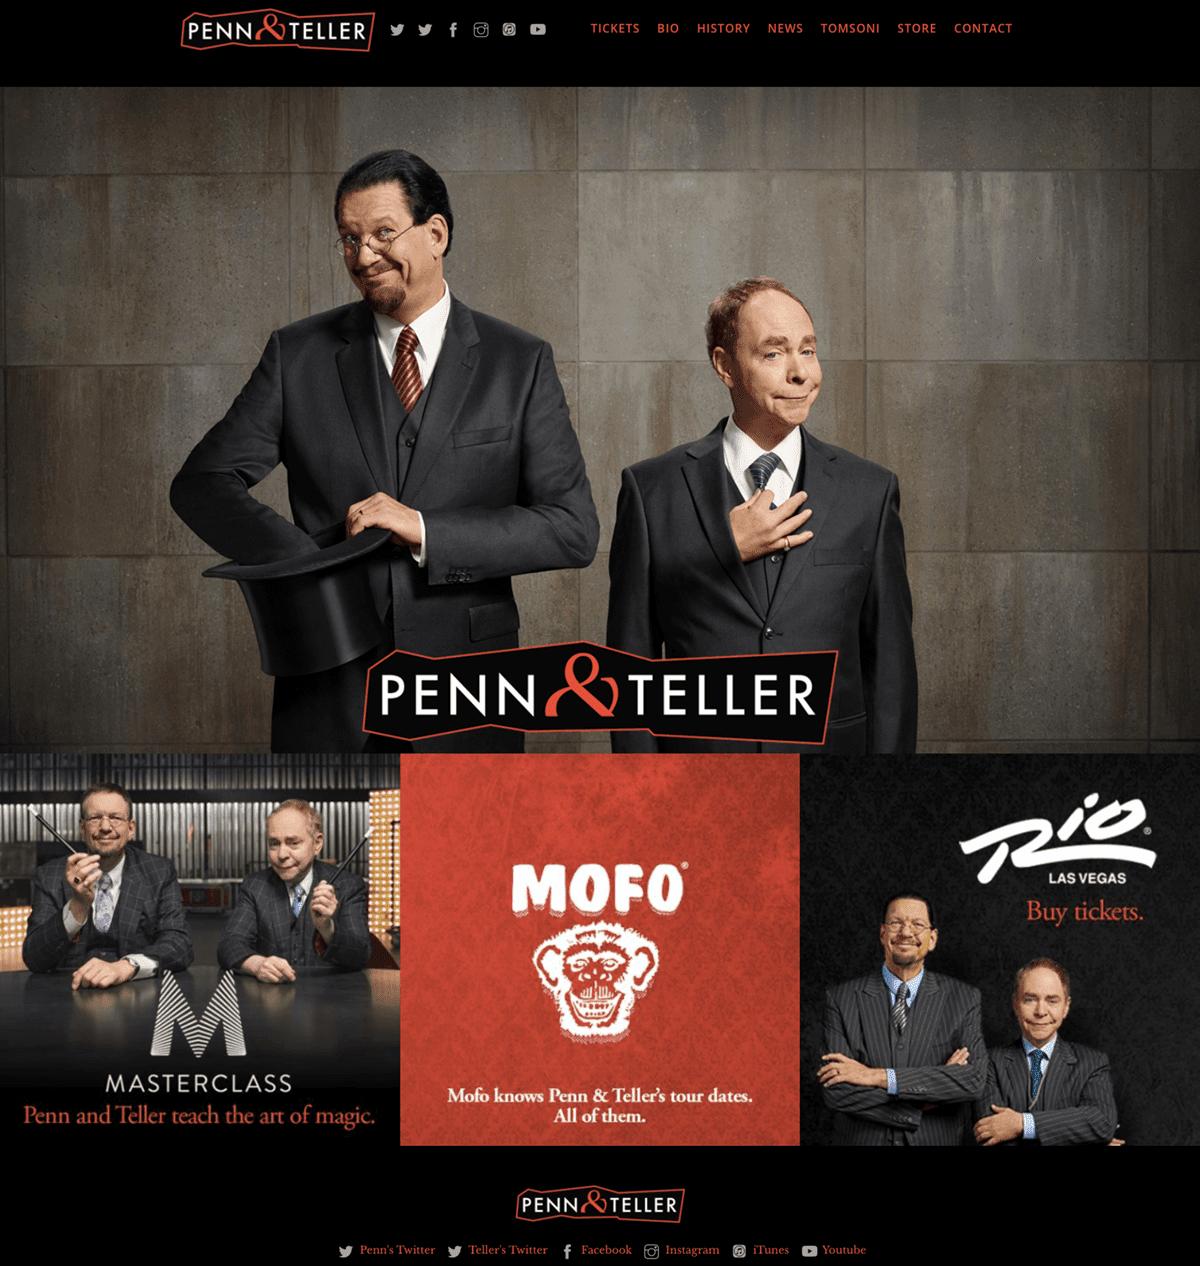 Screengrab of Penn & Teller's dark mode homepage design